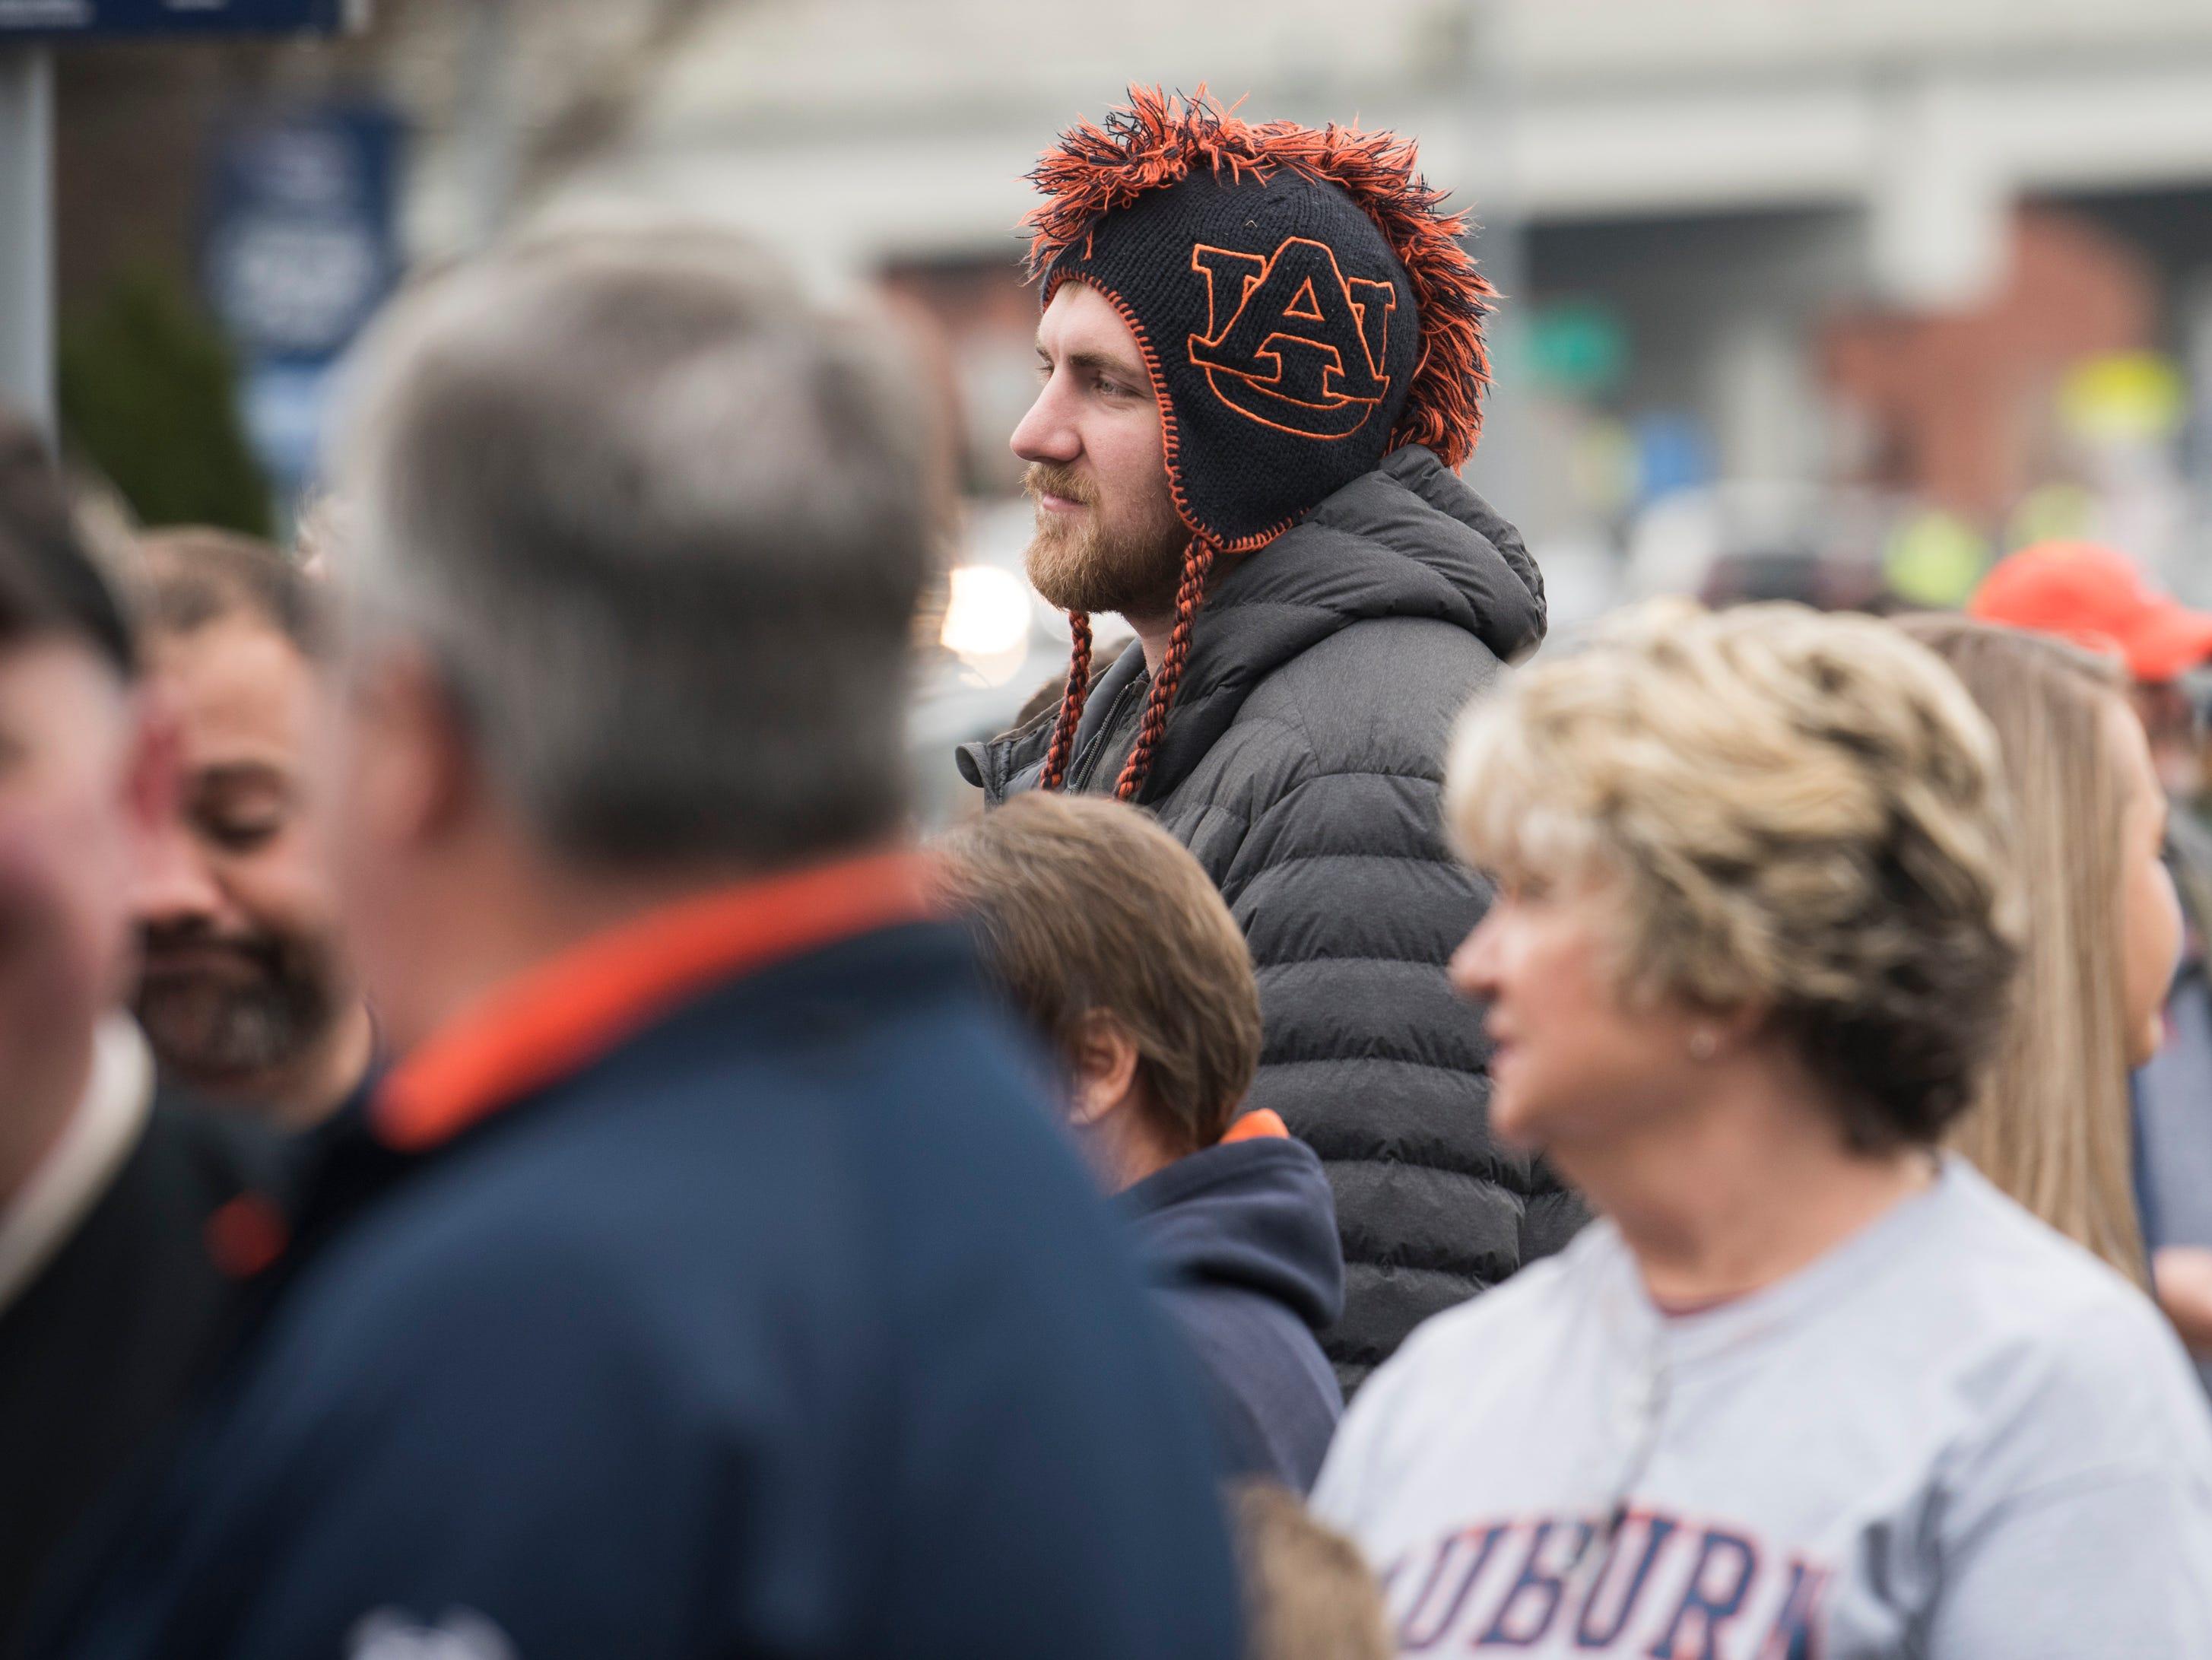 Auburn fans wait in line before Auburn takes on Purdue in the Music City Bowl at Nissan Stadium in Nashville, Tenn., on Friday, Dec. 28, 2018.